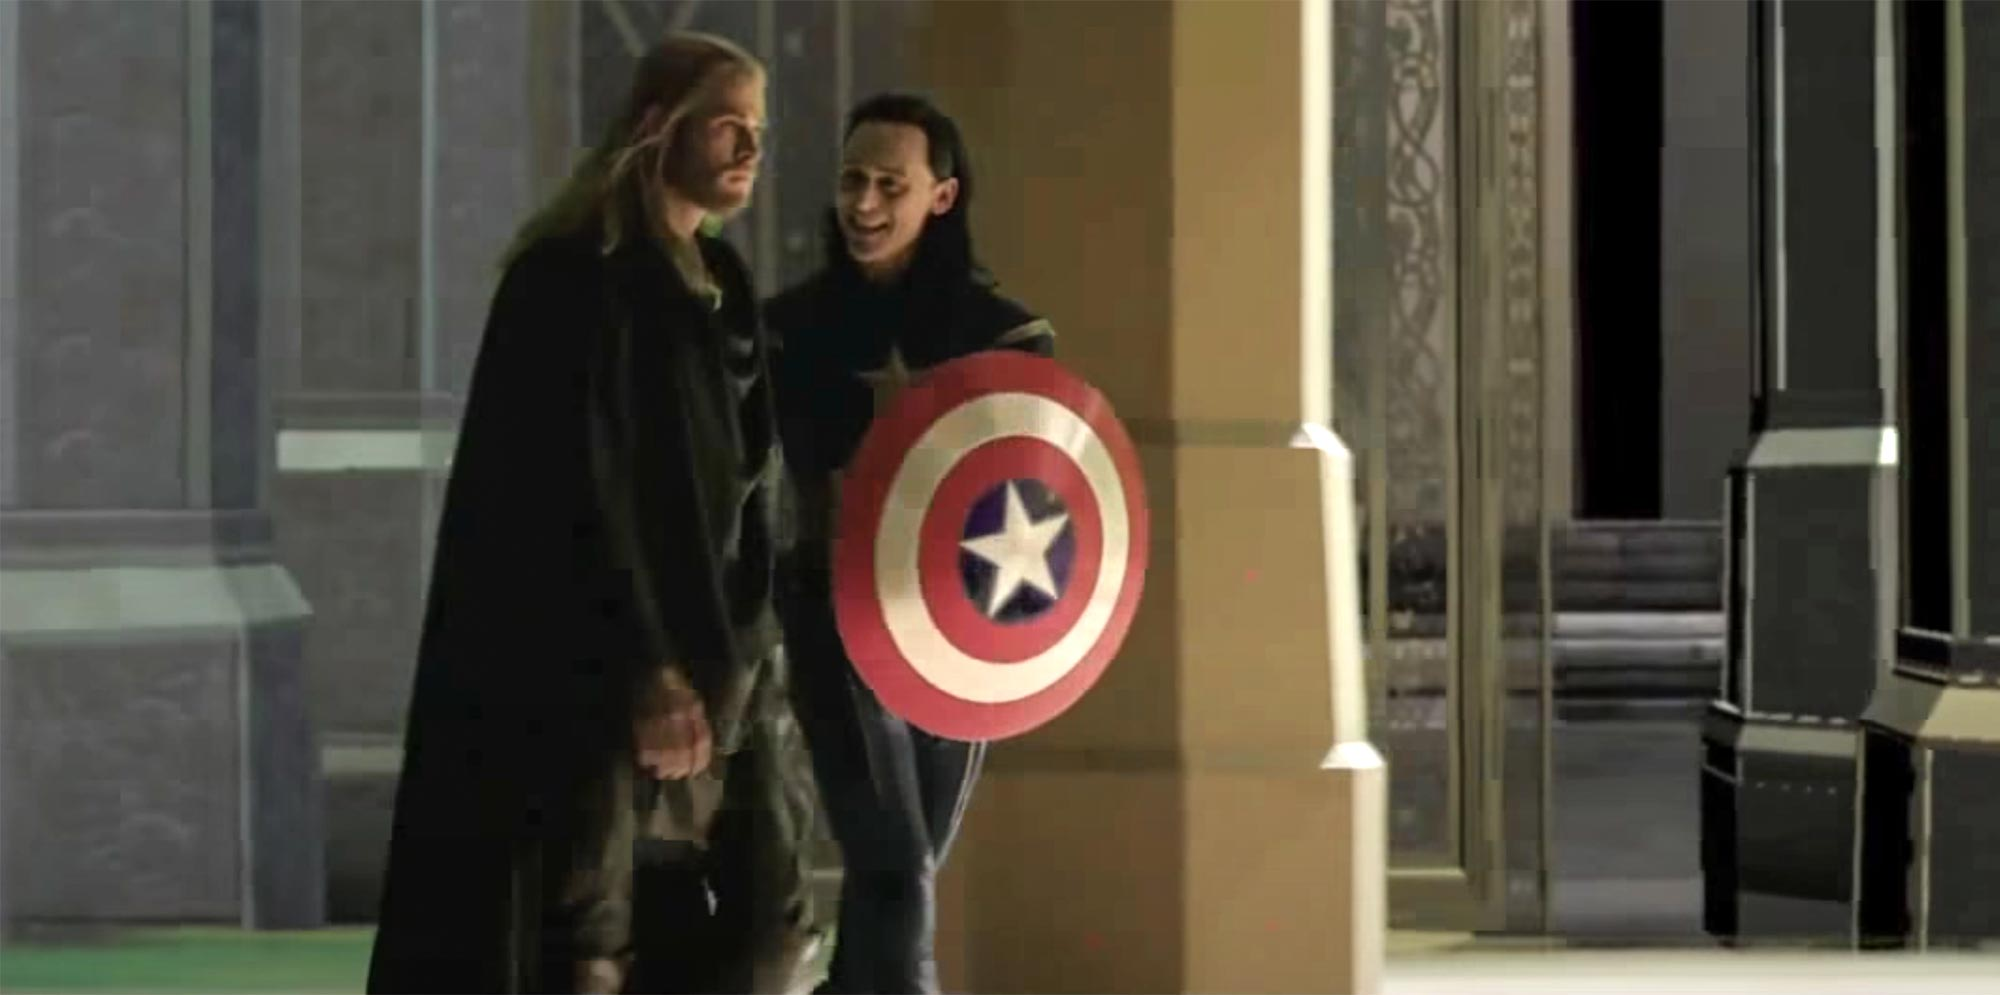 Thor: The Dark World Tom Hiddleston playing Captain America